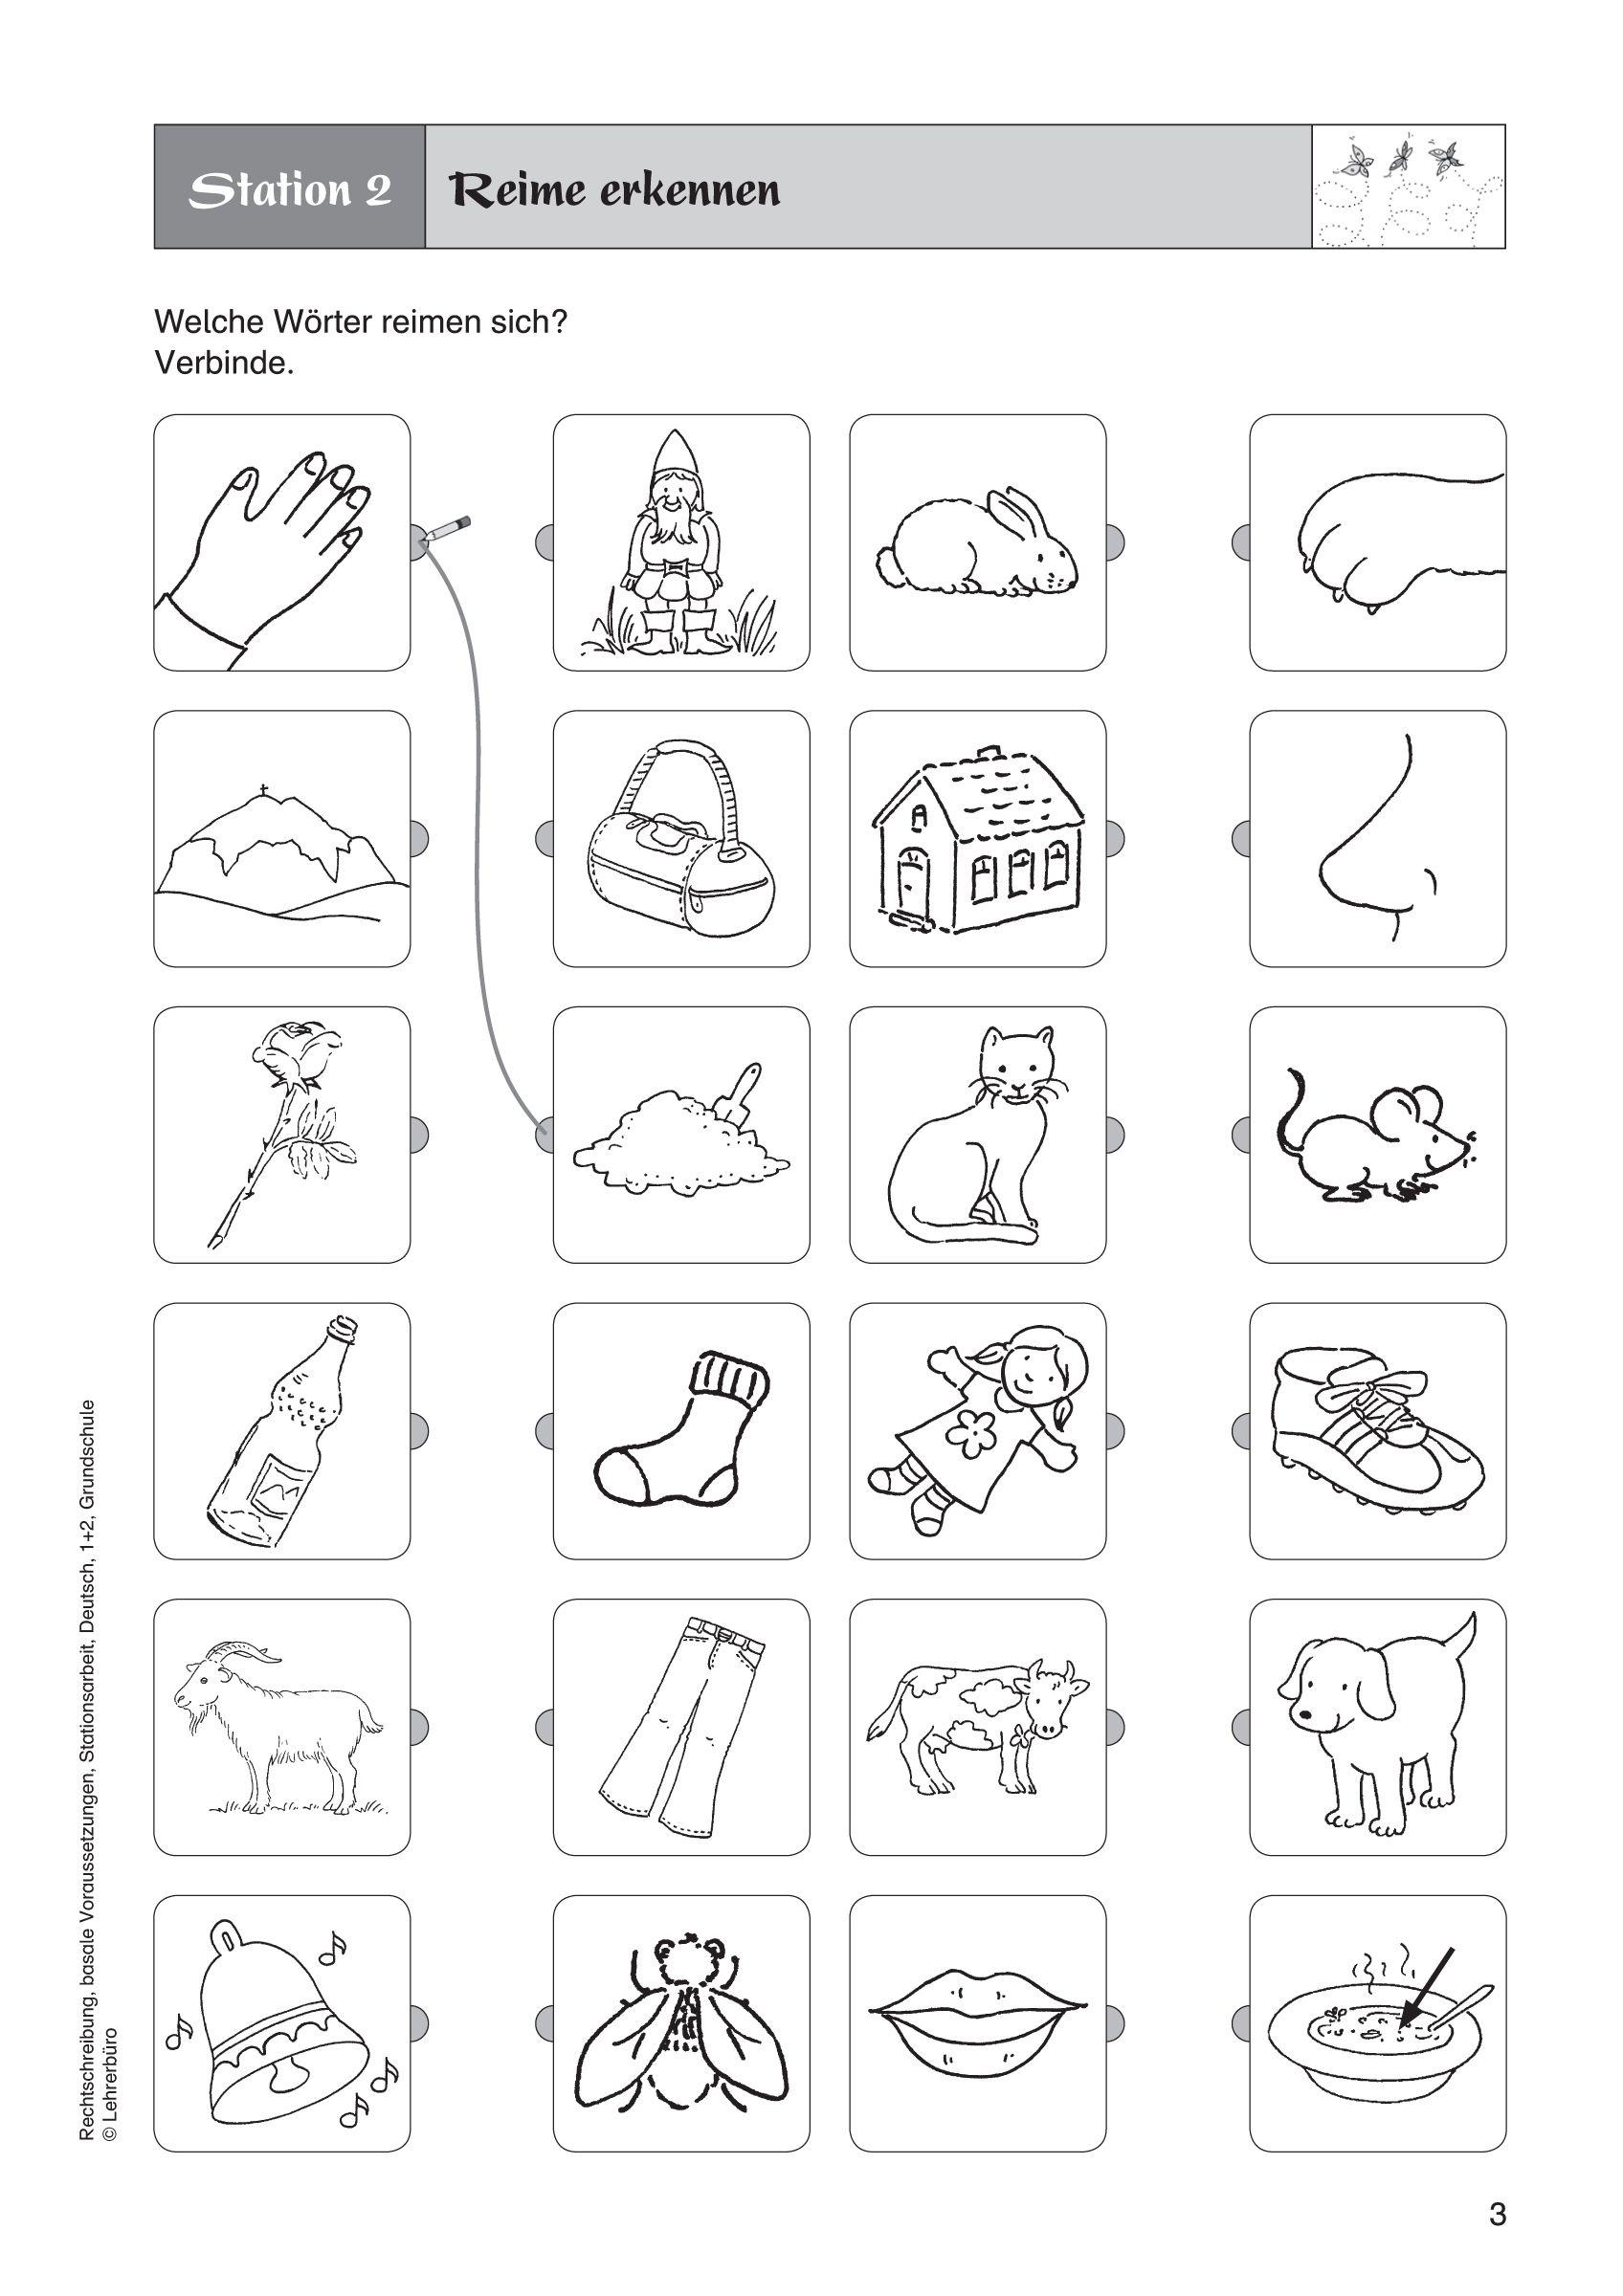 Arbeitsblätter Grundschule 1 Klasse Ausdrucken 1 Klasse verwandt mit Arbeitsblätter Kindergarten Kostenlos Ausdrucken